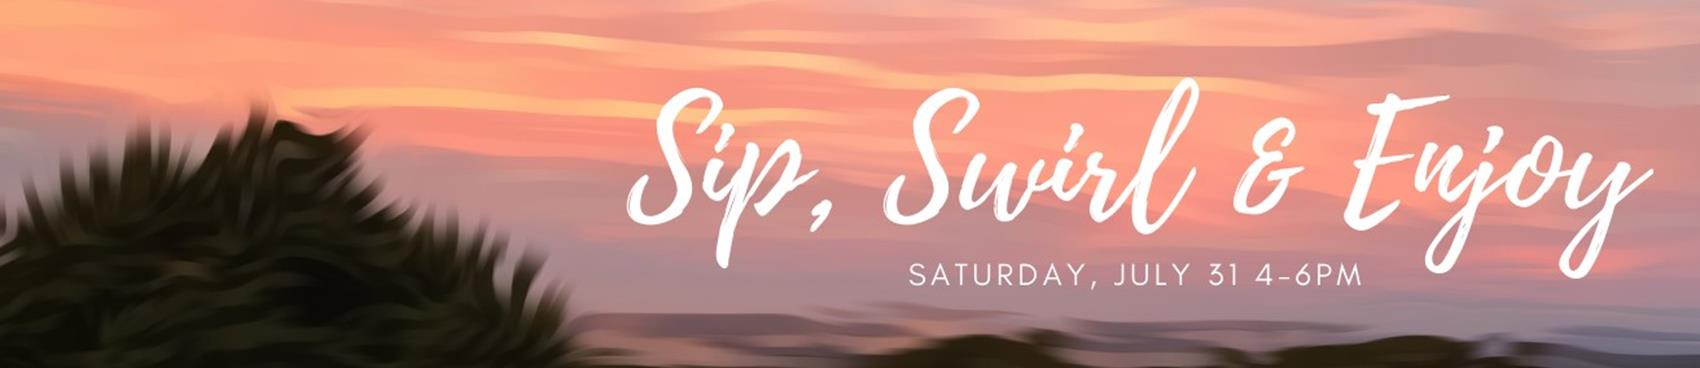 Sip, Swirl, & Enjoy